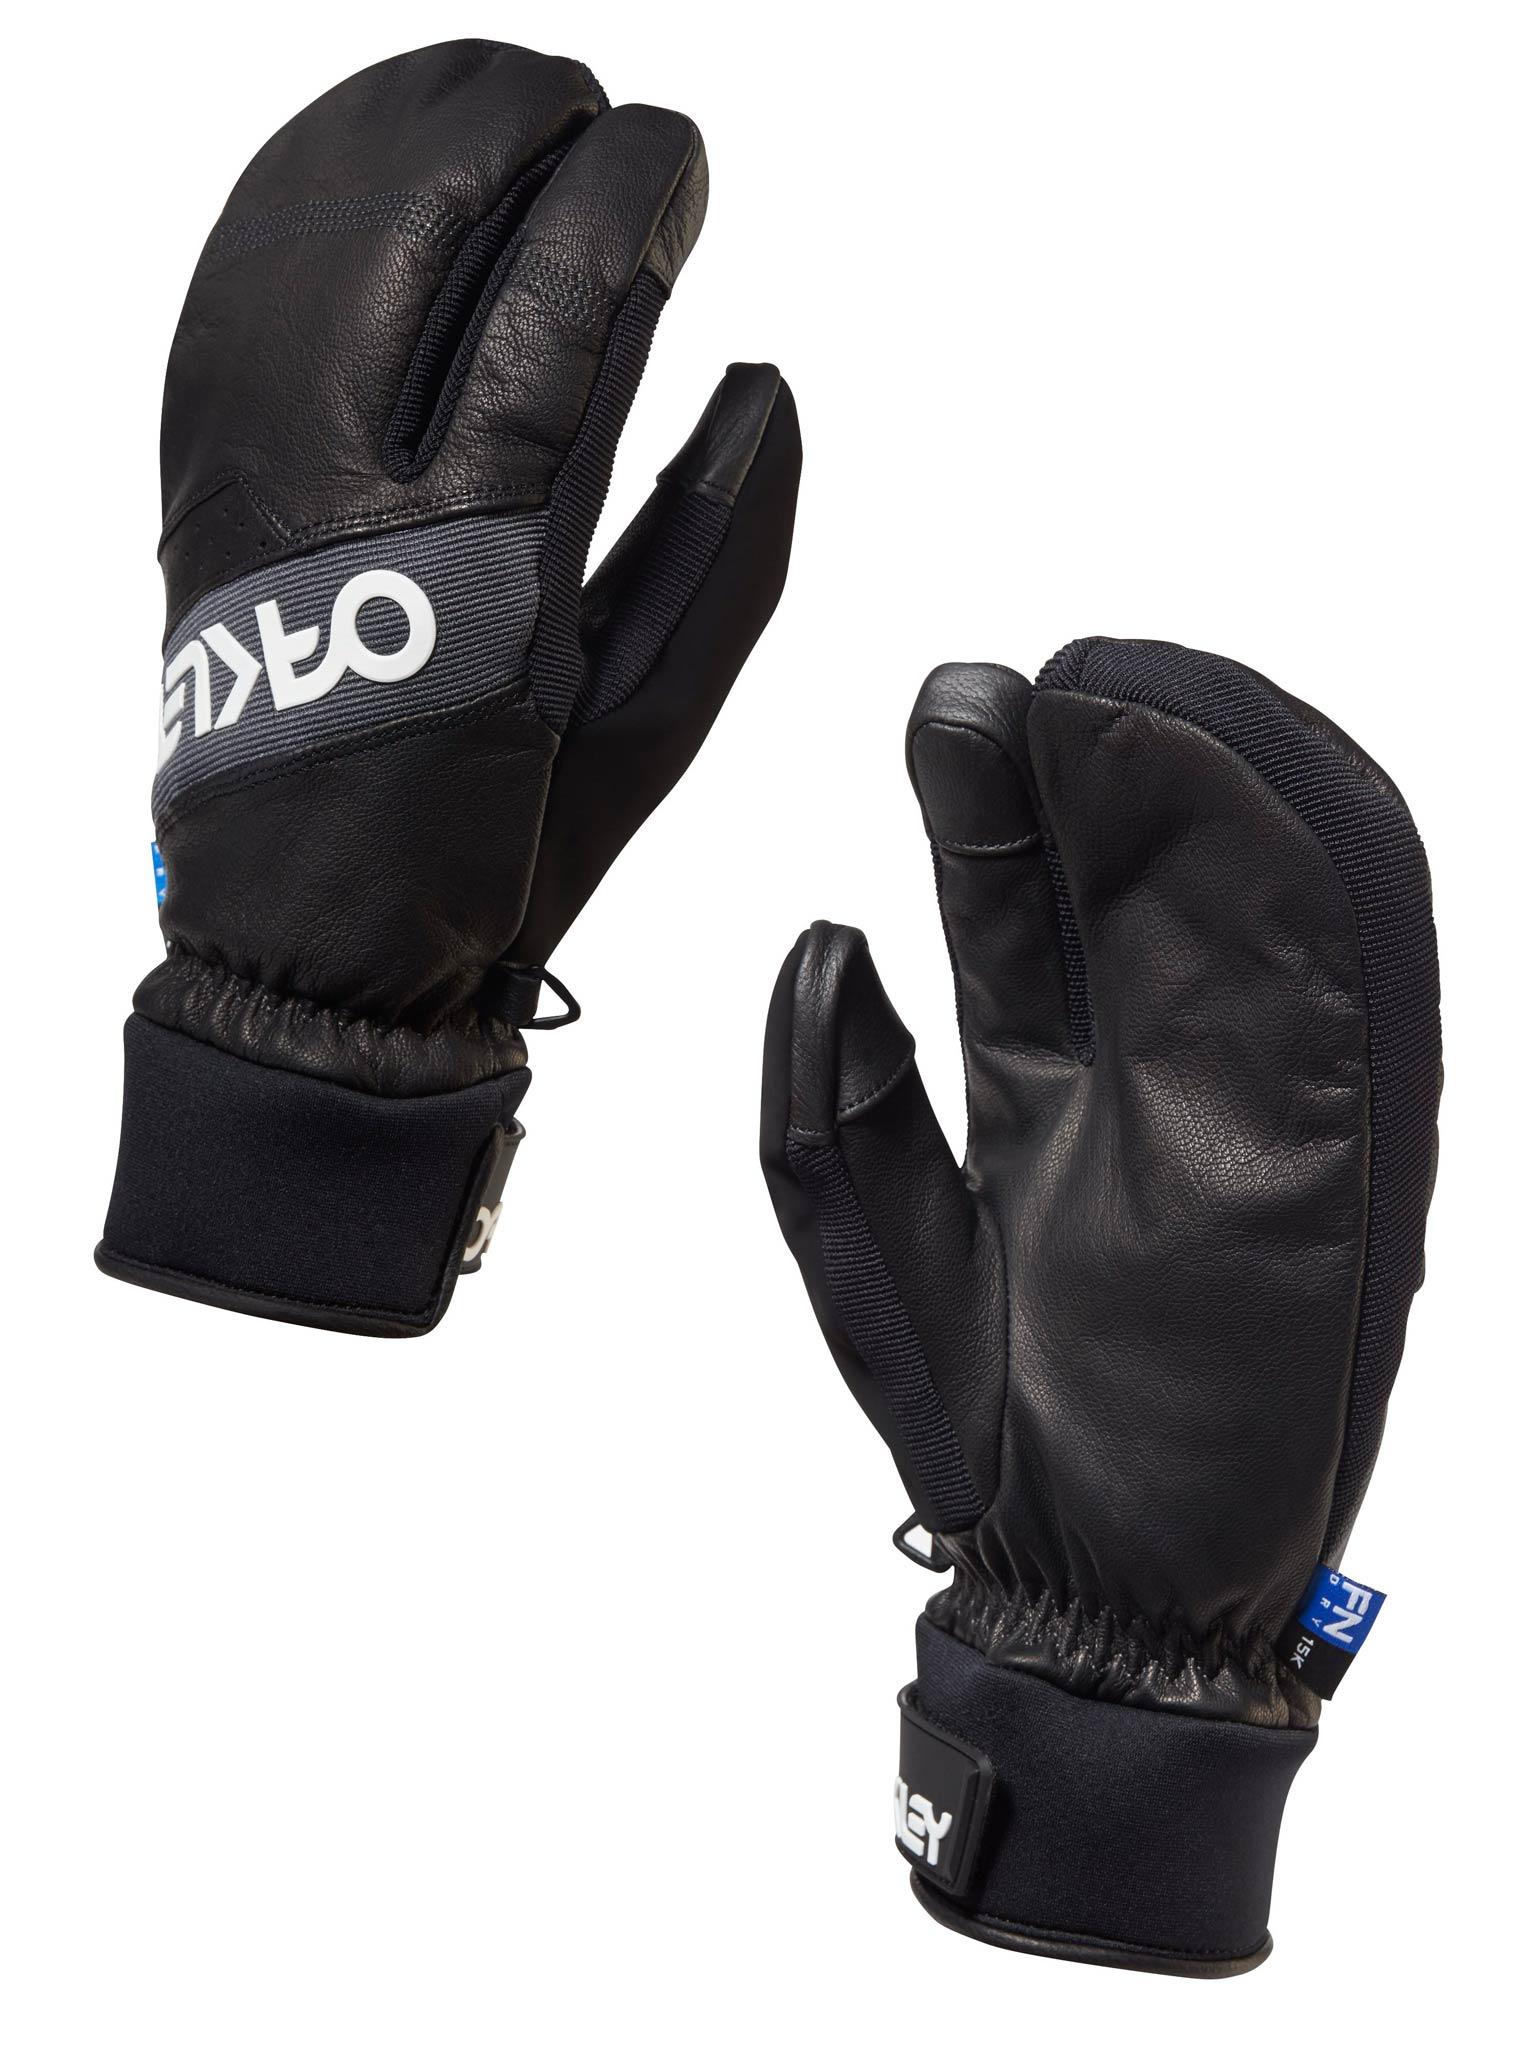 Oakley Factory Winter Trigger Mittens Skihandschuhe 17/18 - Farbe: Black